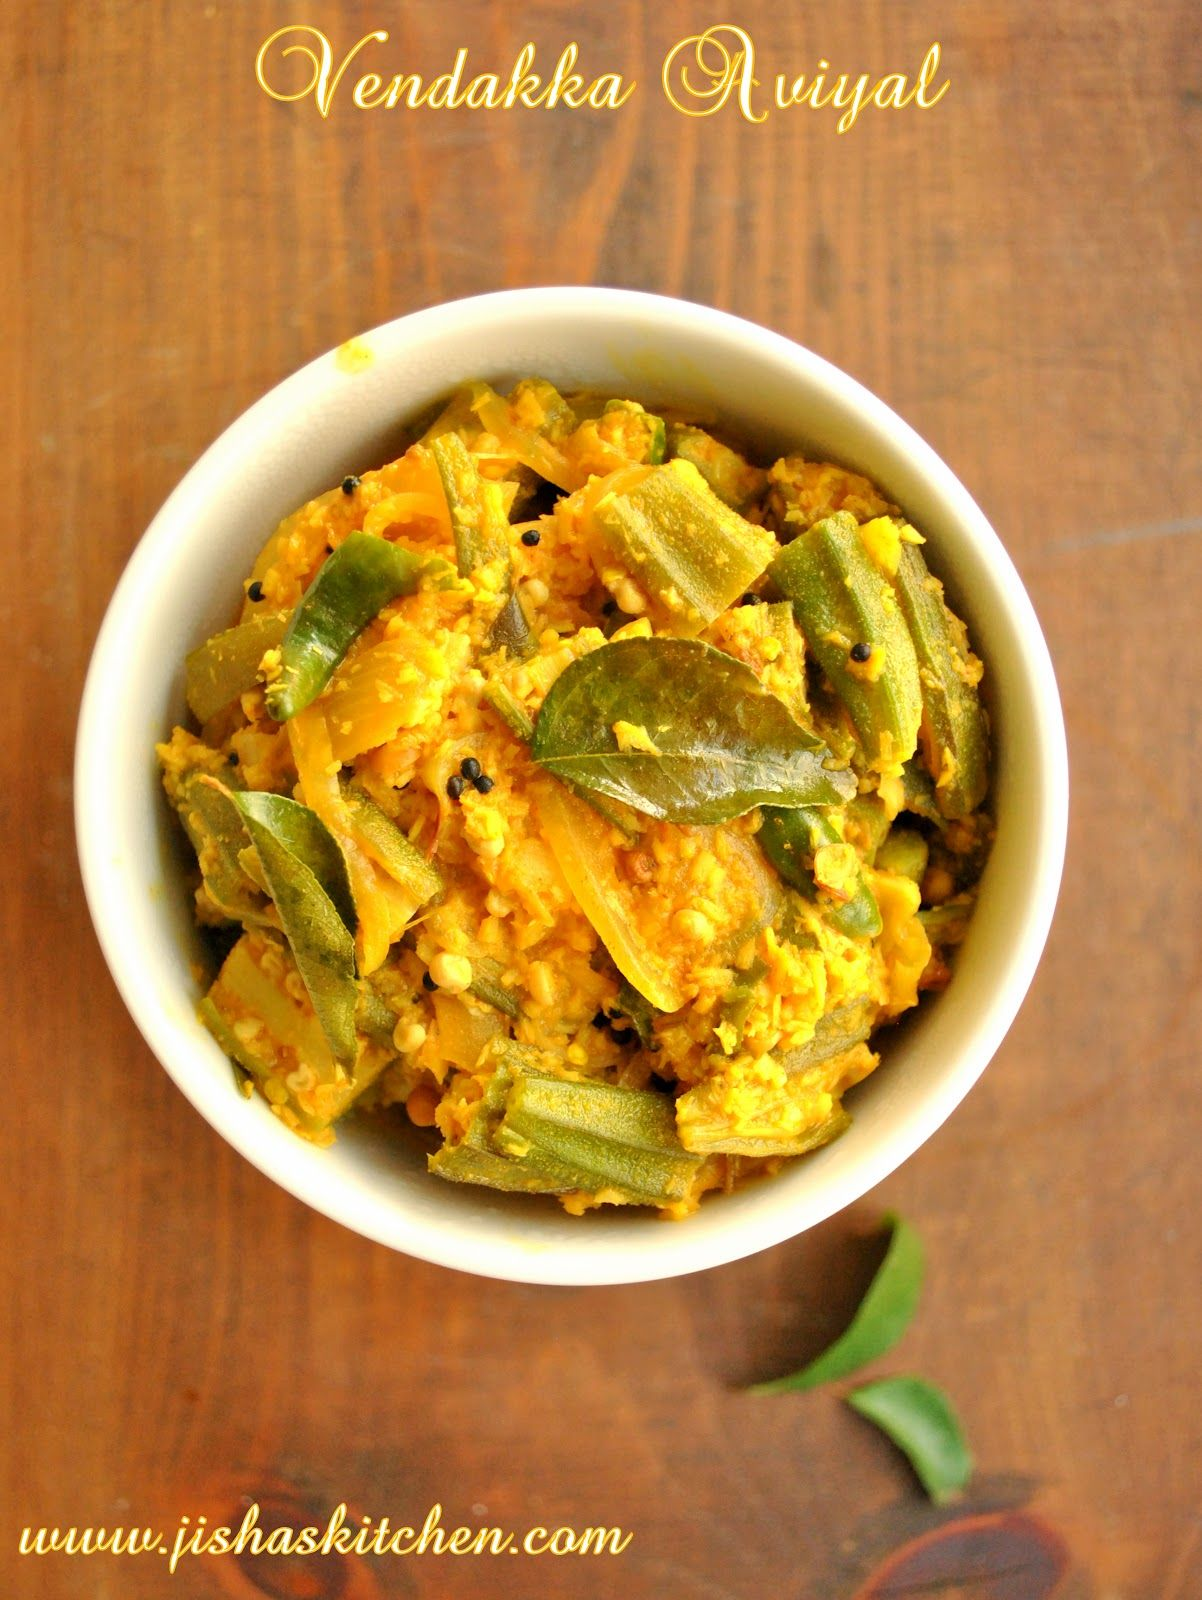 Jisha S Kitchen Vendakka Aviyal Indian Recipes Kerala Nadan